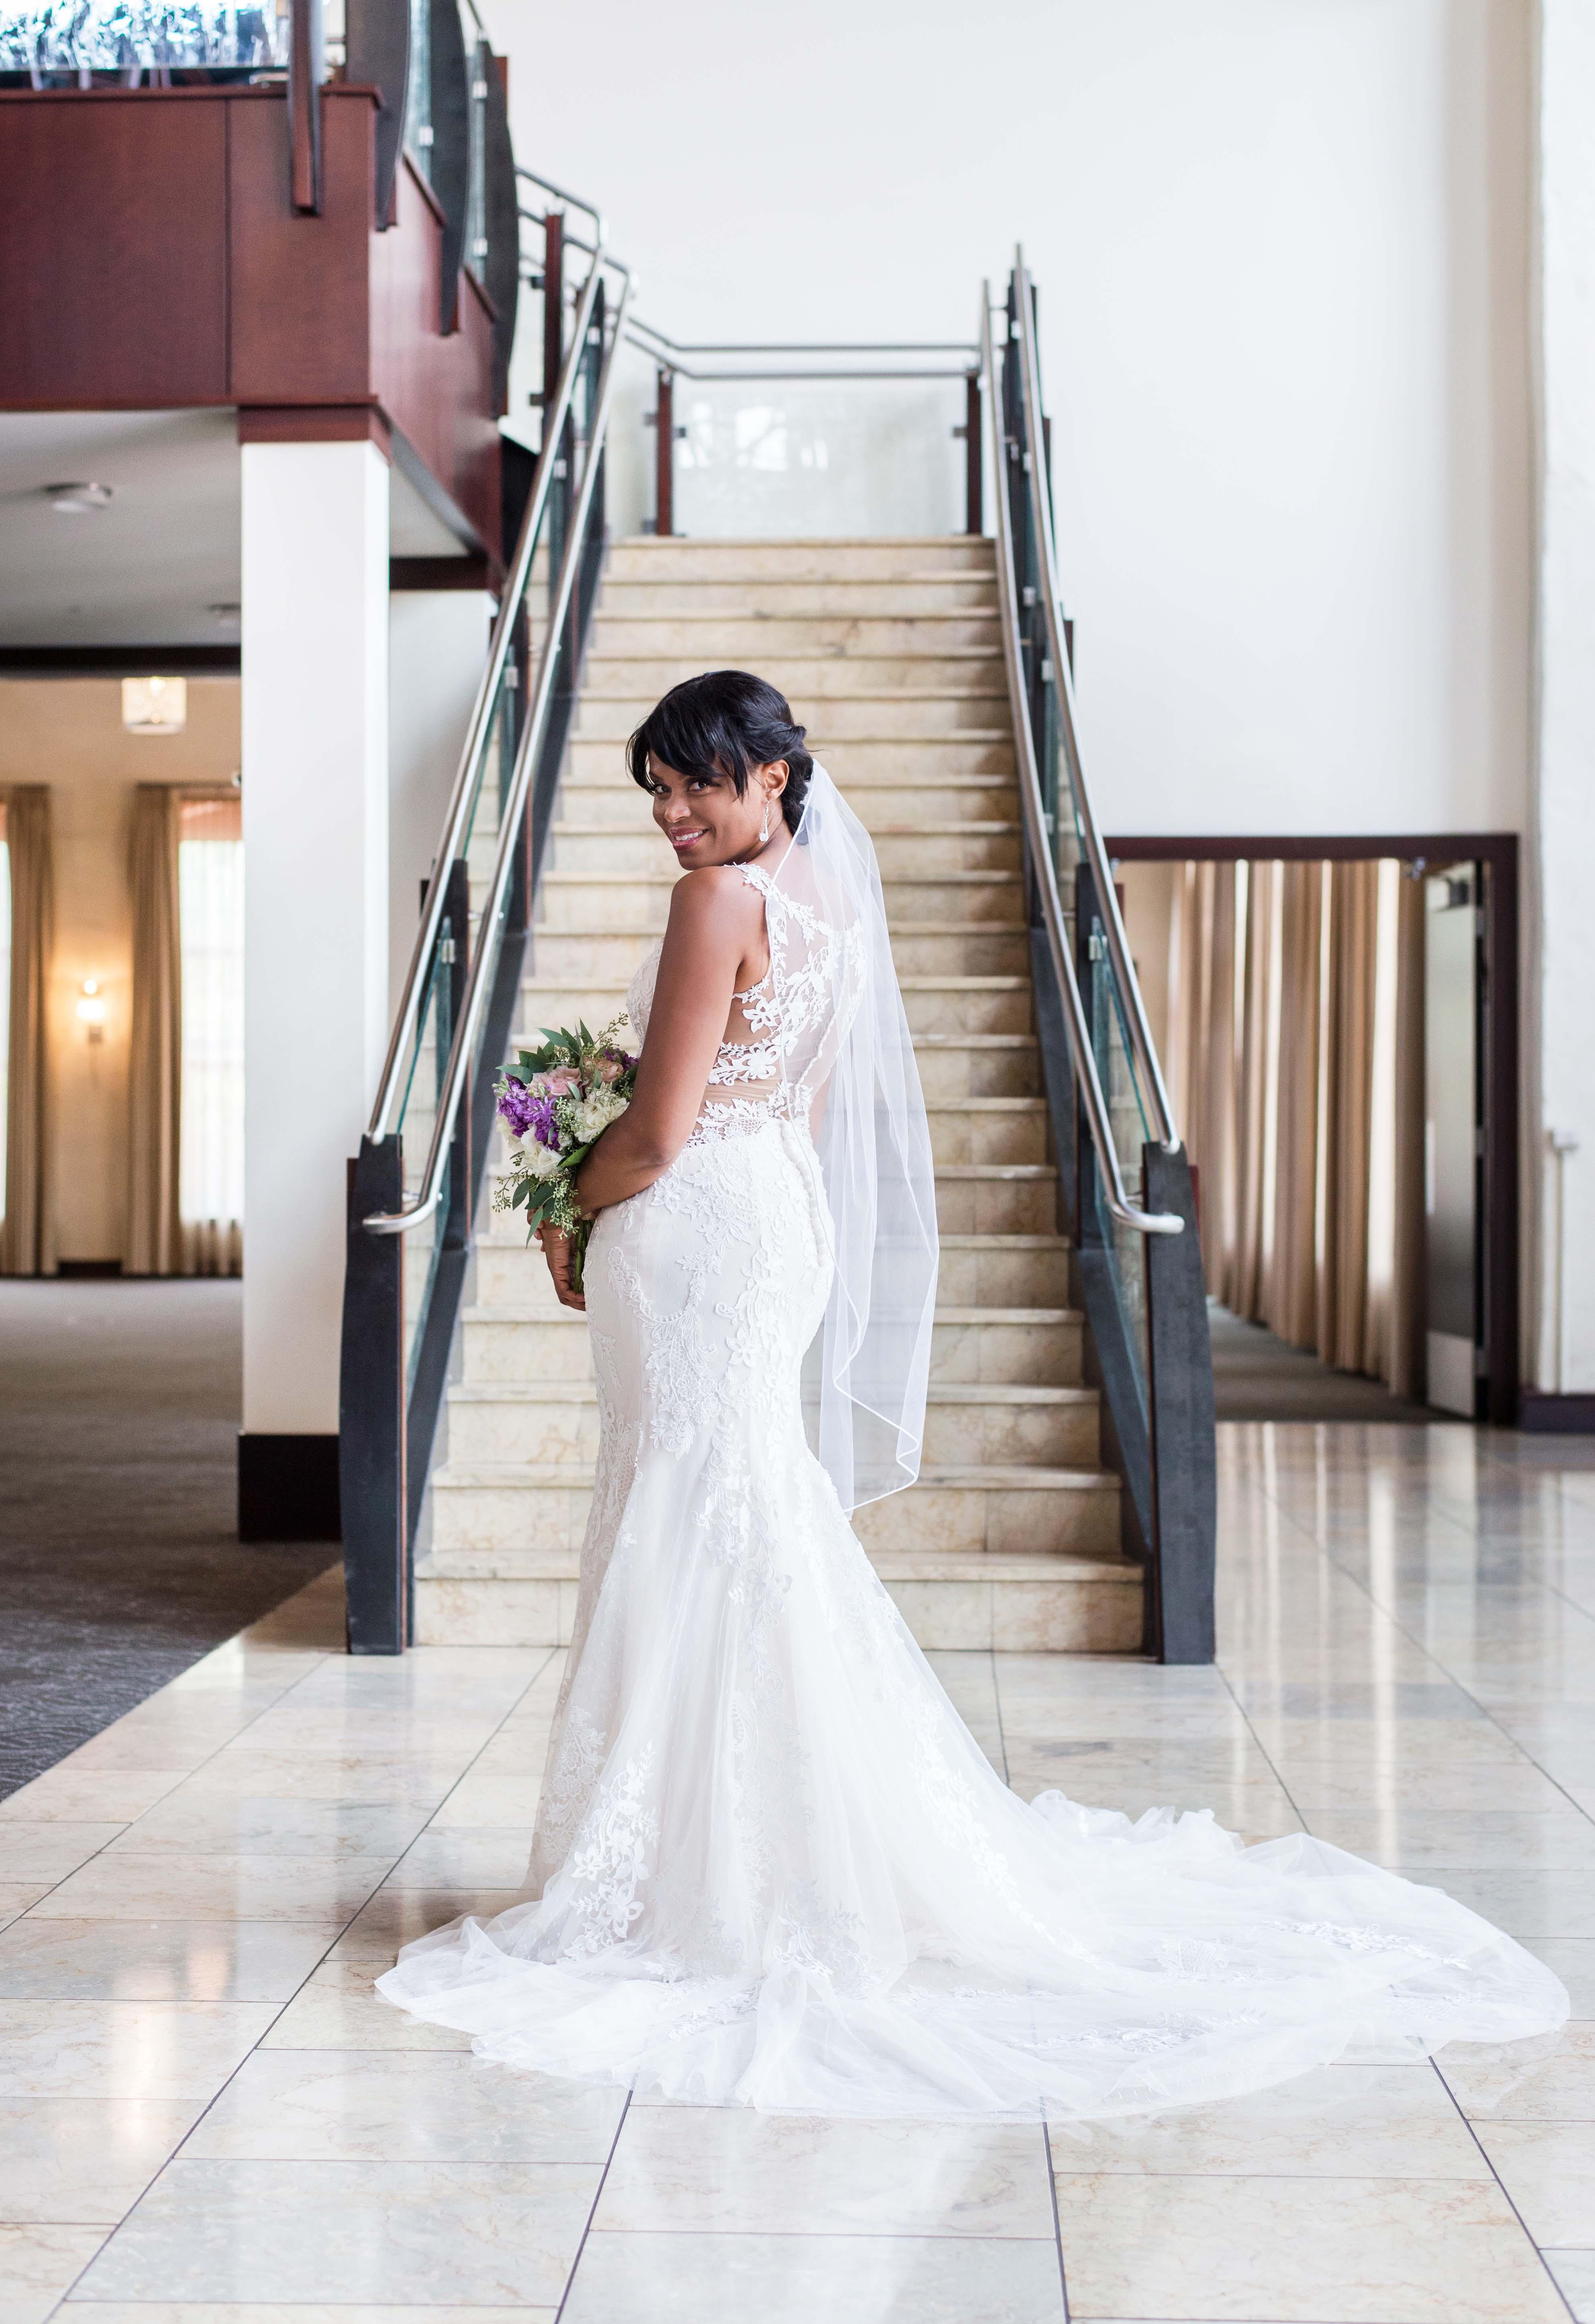 Wedding-Photography-The-Foundry-Pheonixville-Pennsylvania-Andrea-Krout-Luxury-Portrait-5 copy